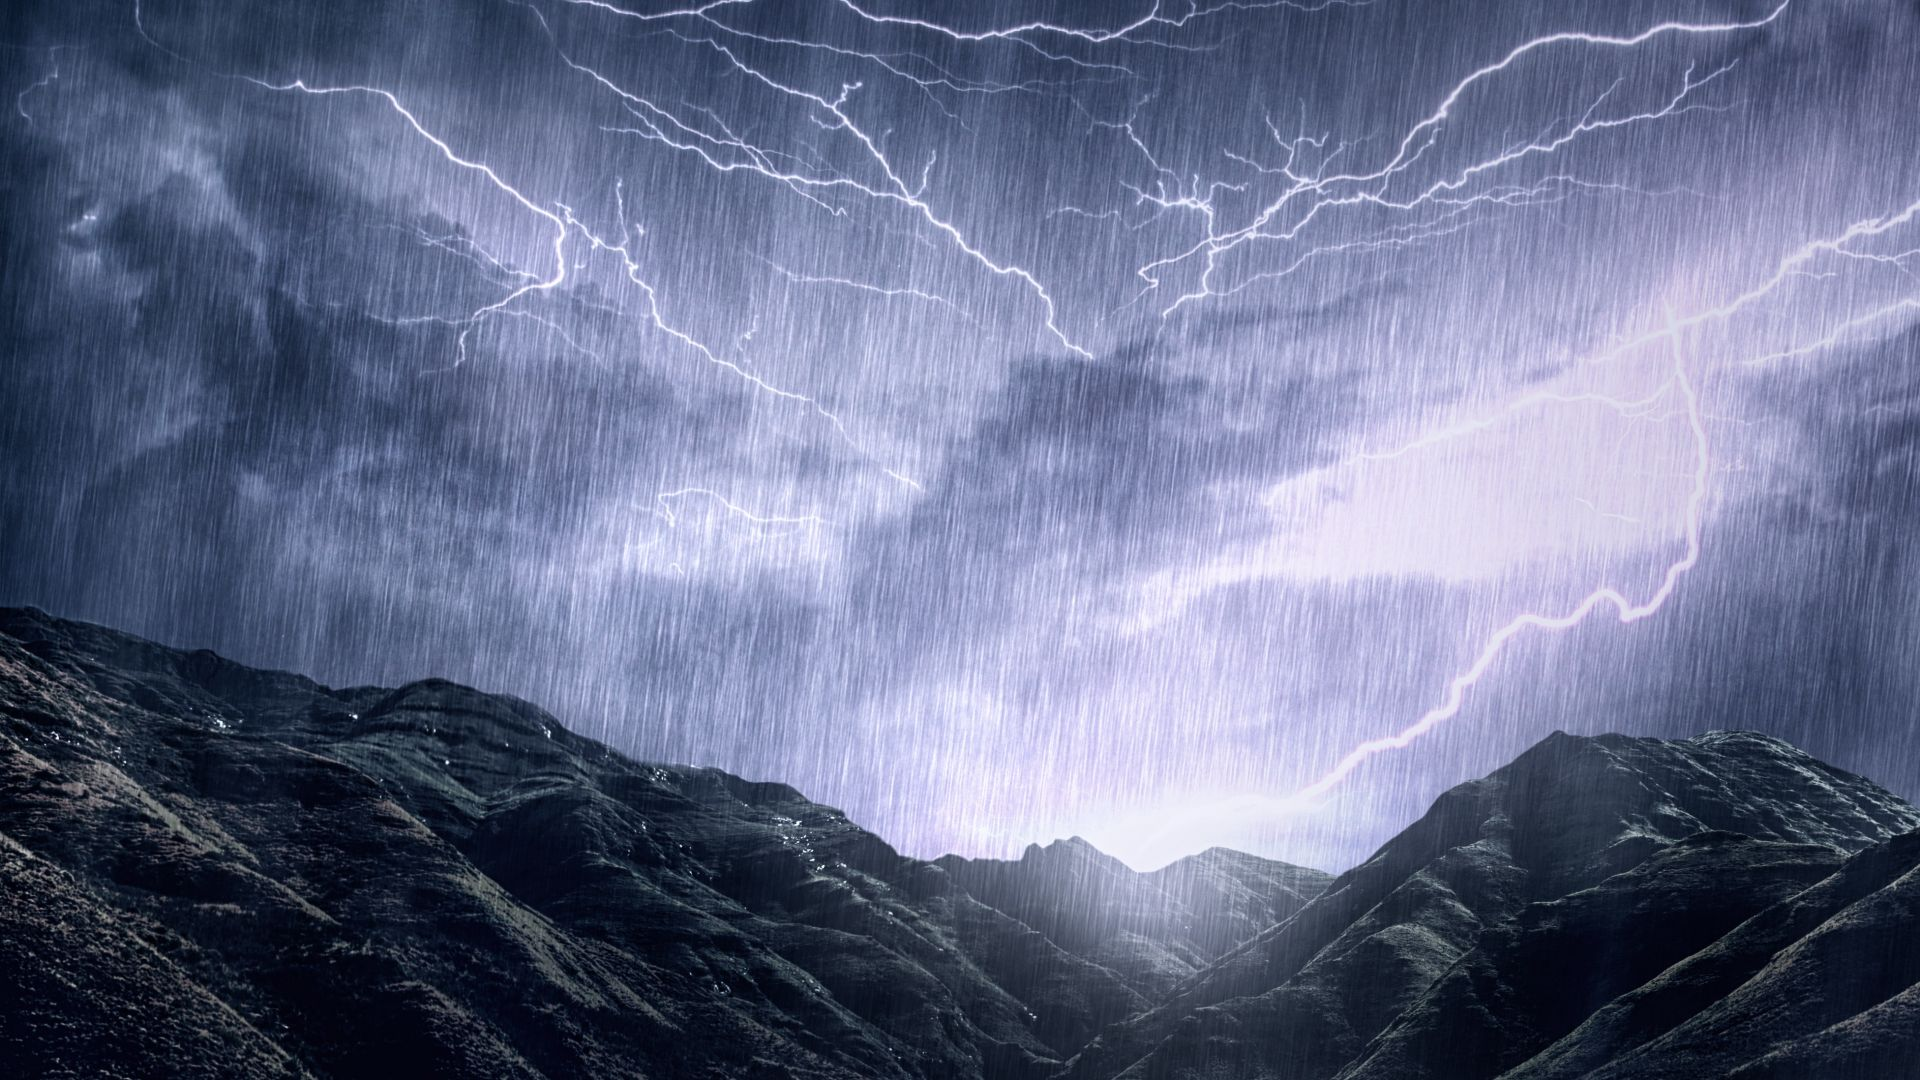 ПСС: Не правете преходи по високите планински части заради лошото време